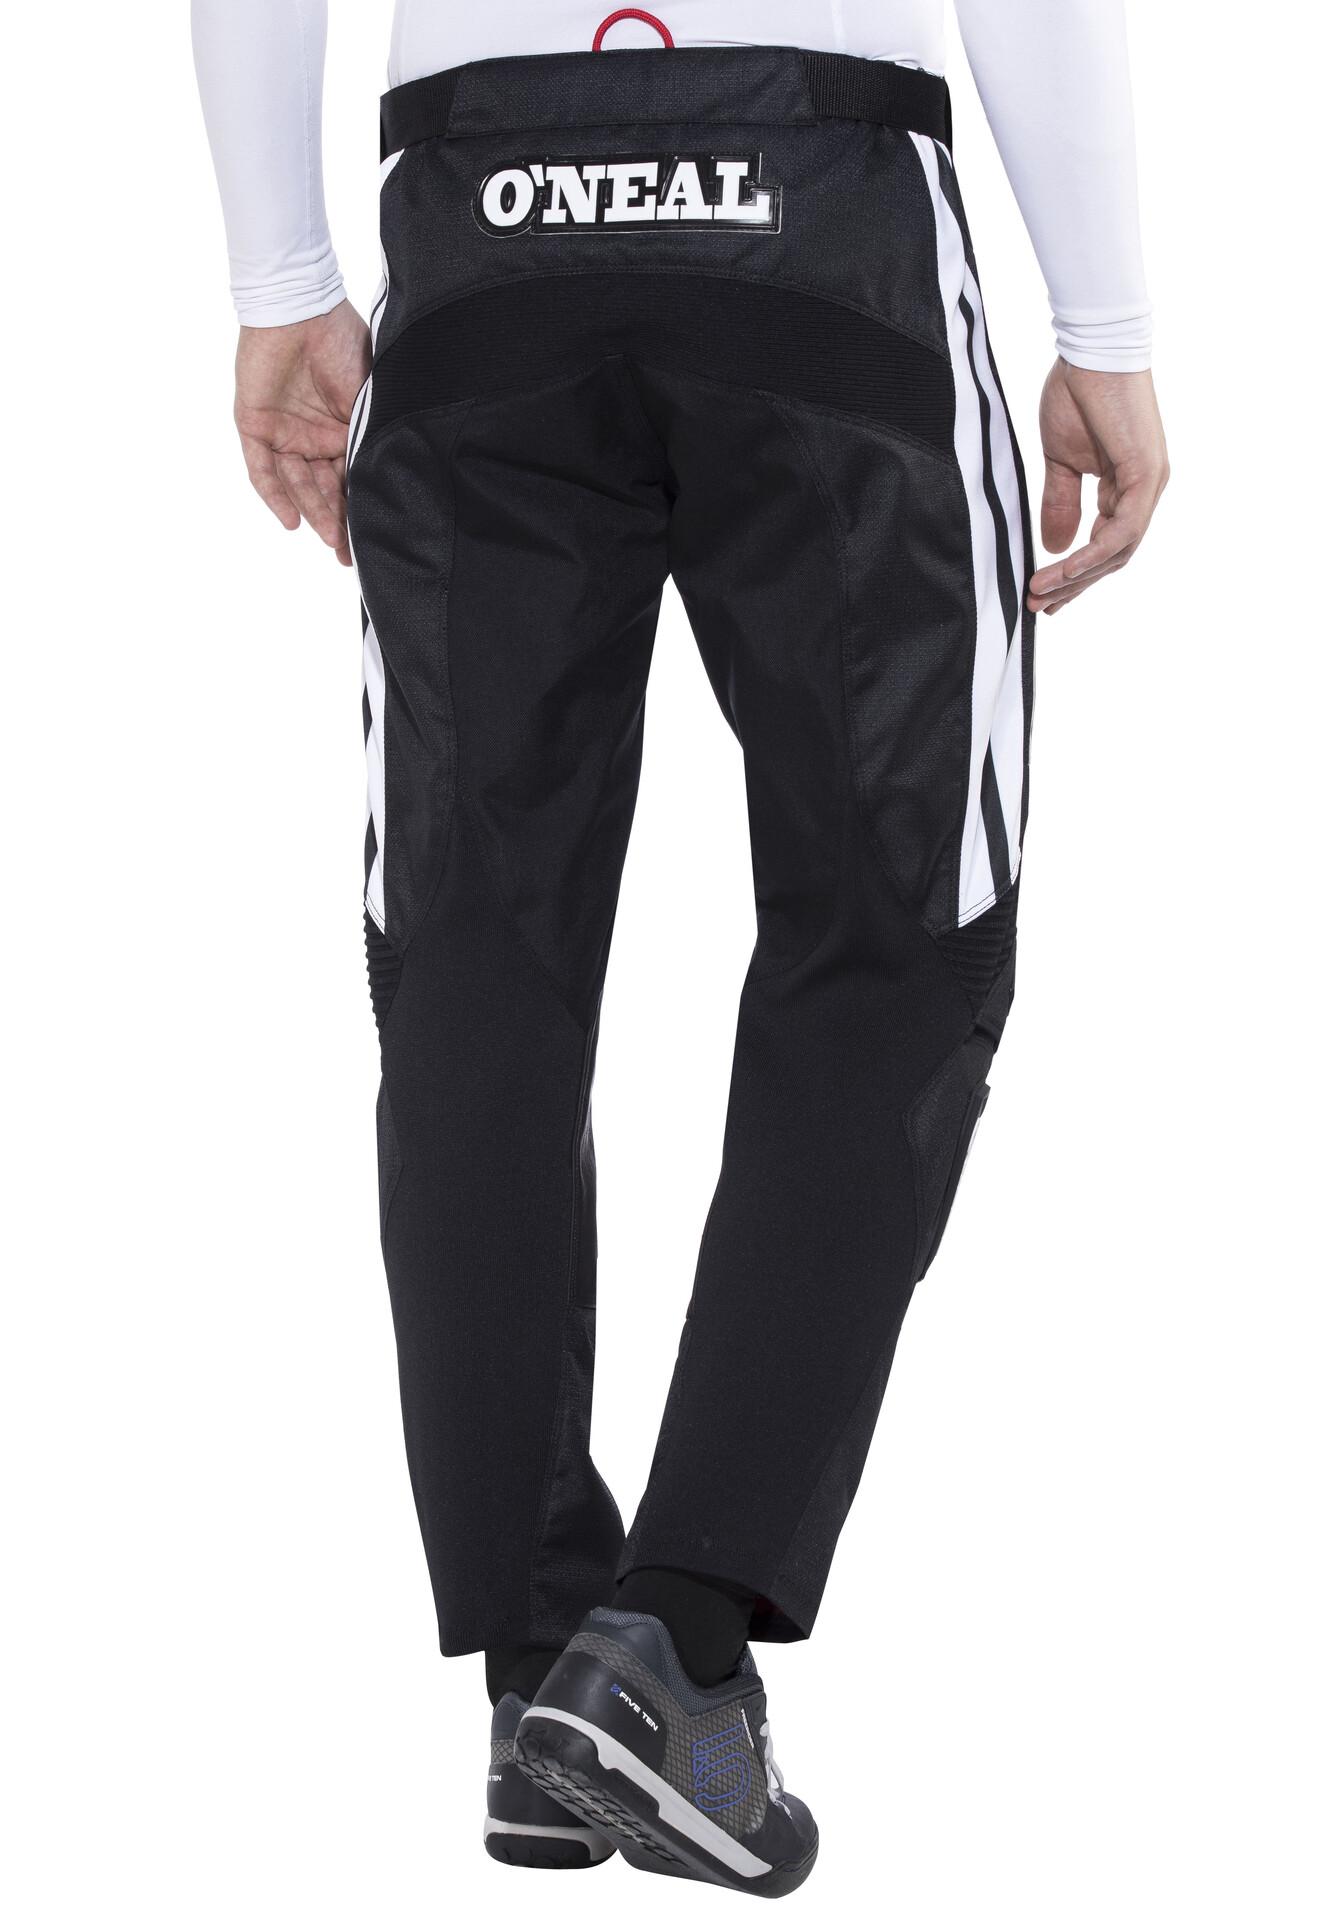 ONeal Ultra-Lite 75 Mens Pant Black//White, 34